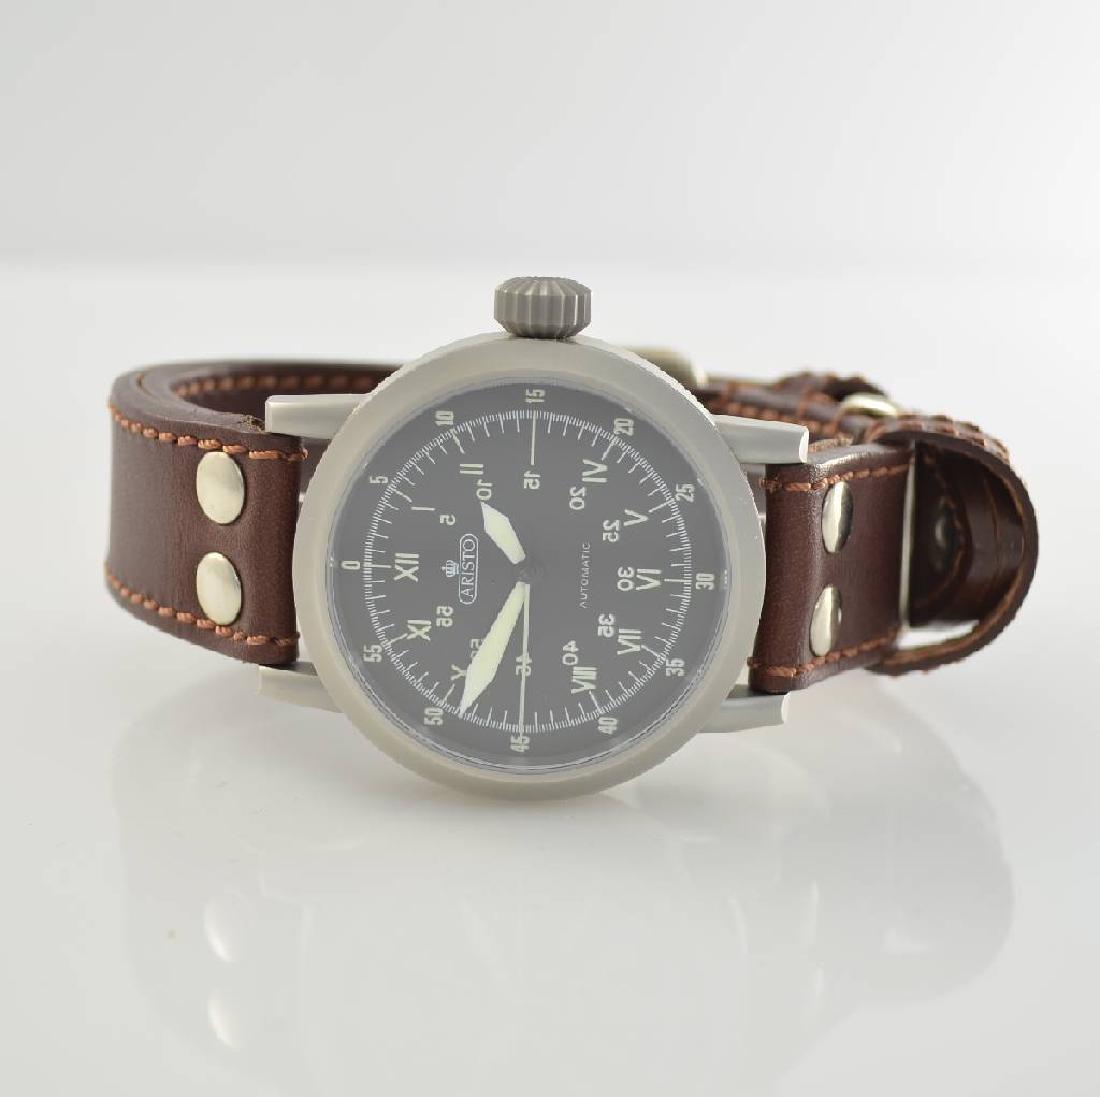 ARISTO gents wristwatch in stainless steel